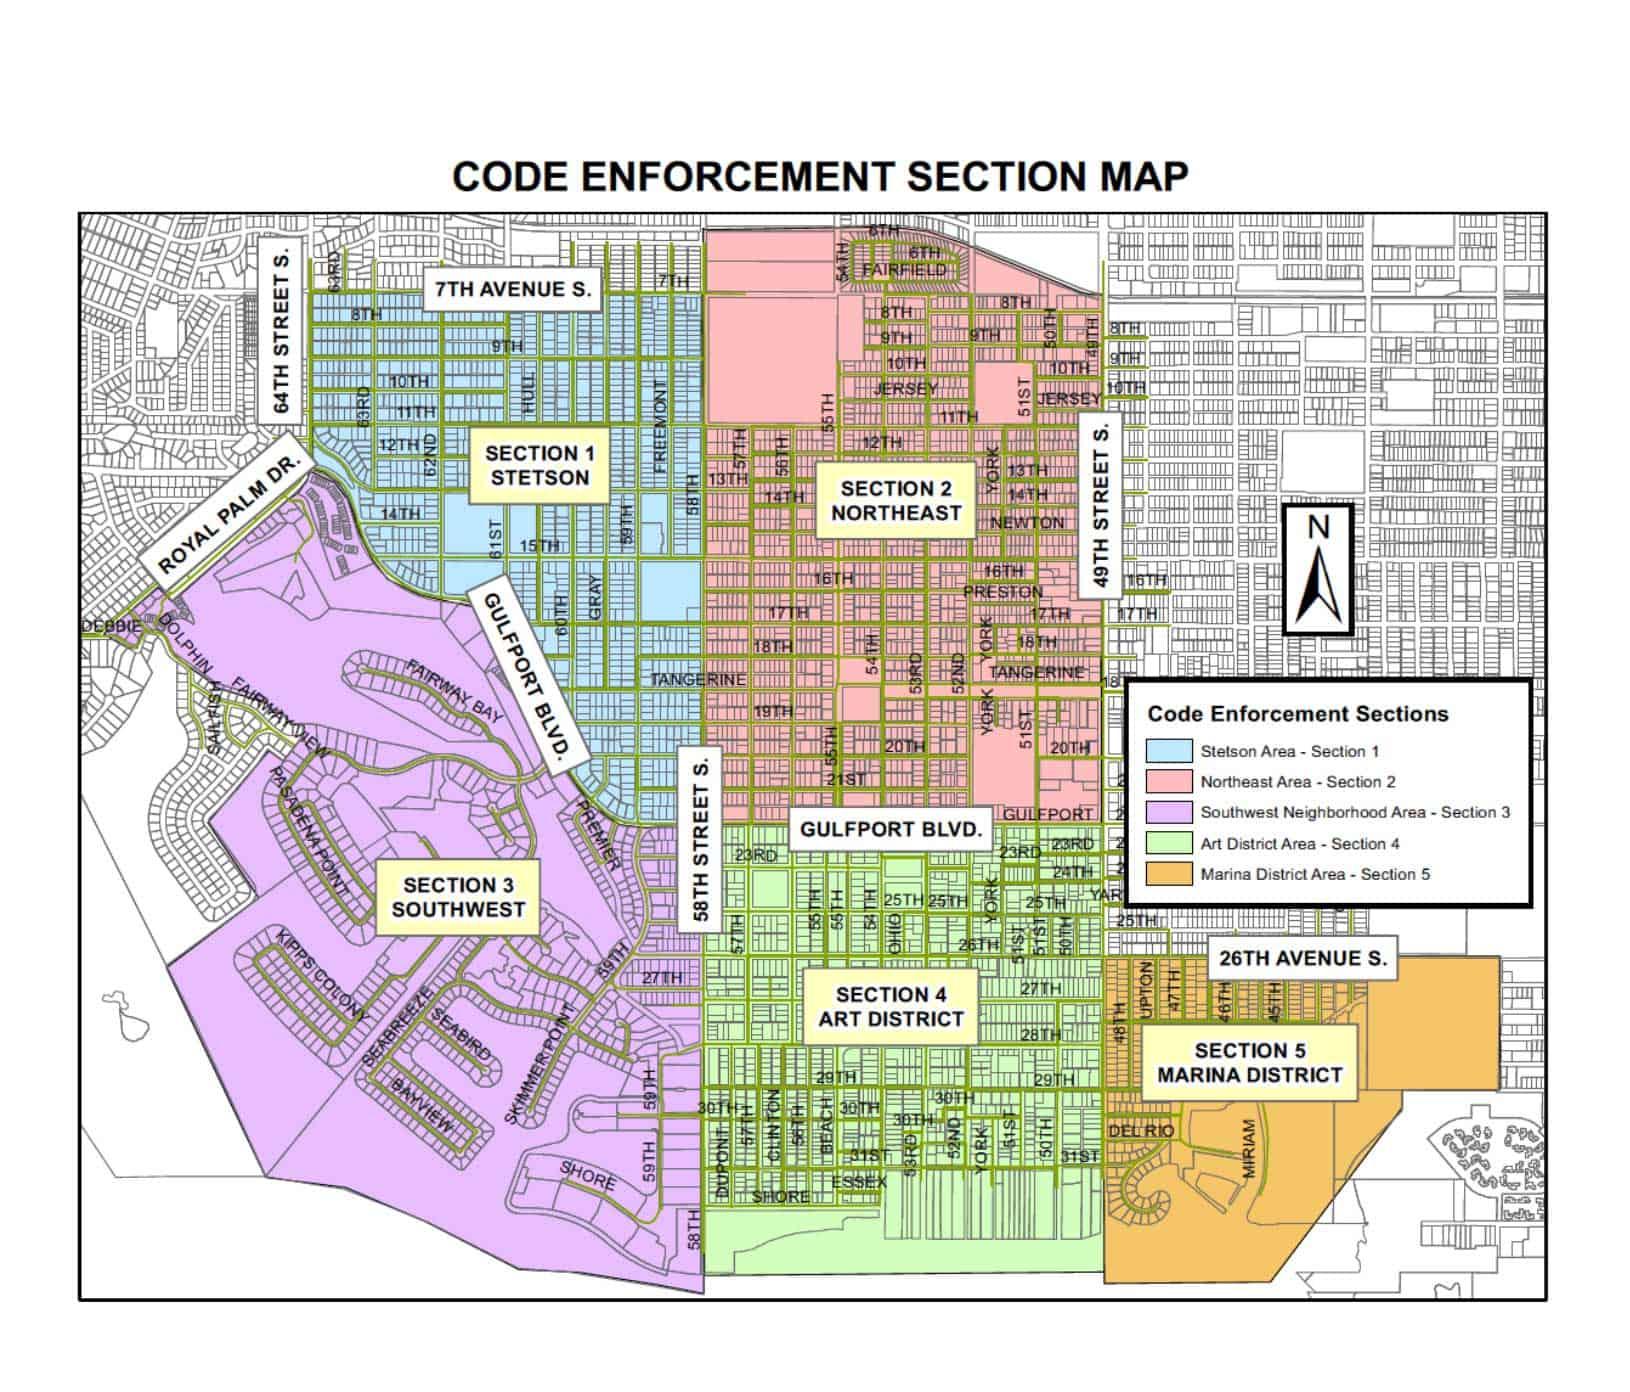 Code Enforcement Section Map